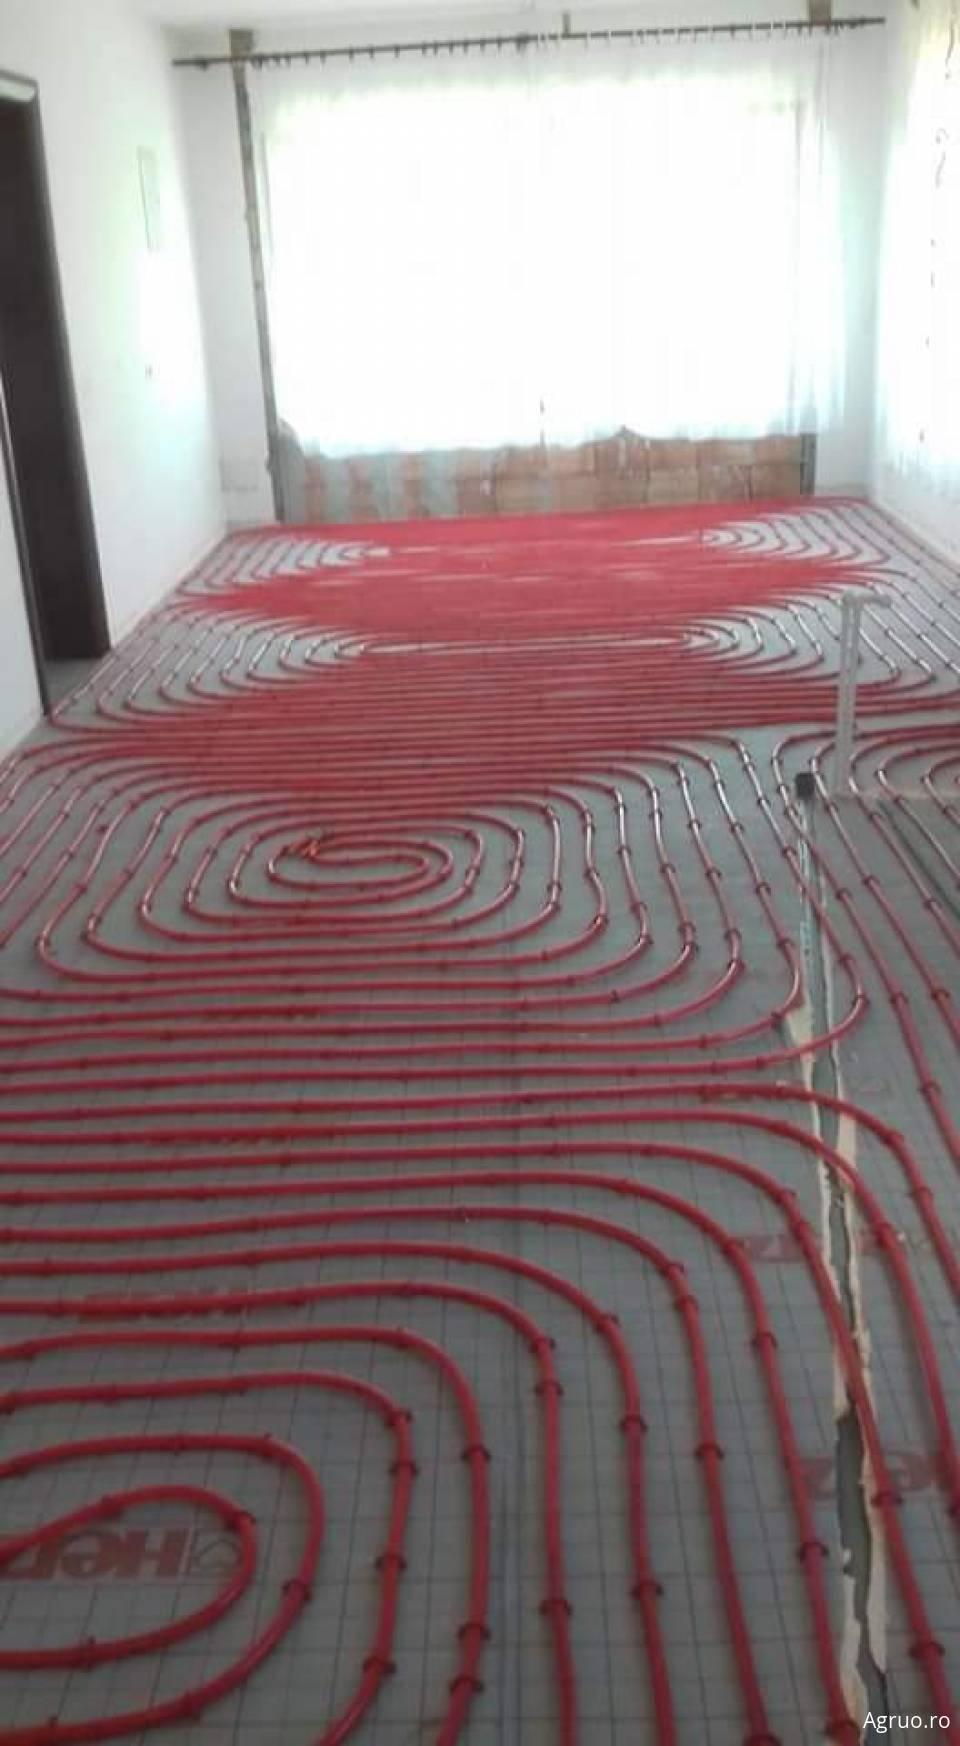 Montaj instalatii de incalzire prin pardoseala5700